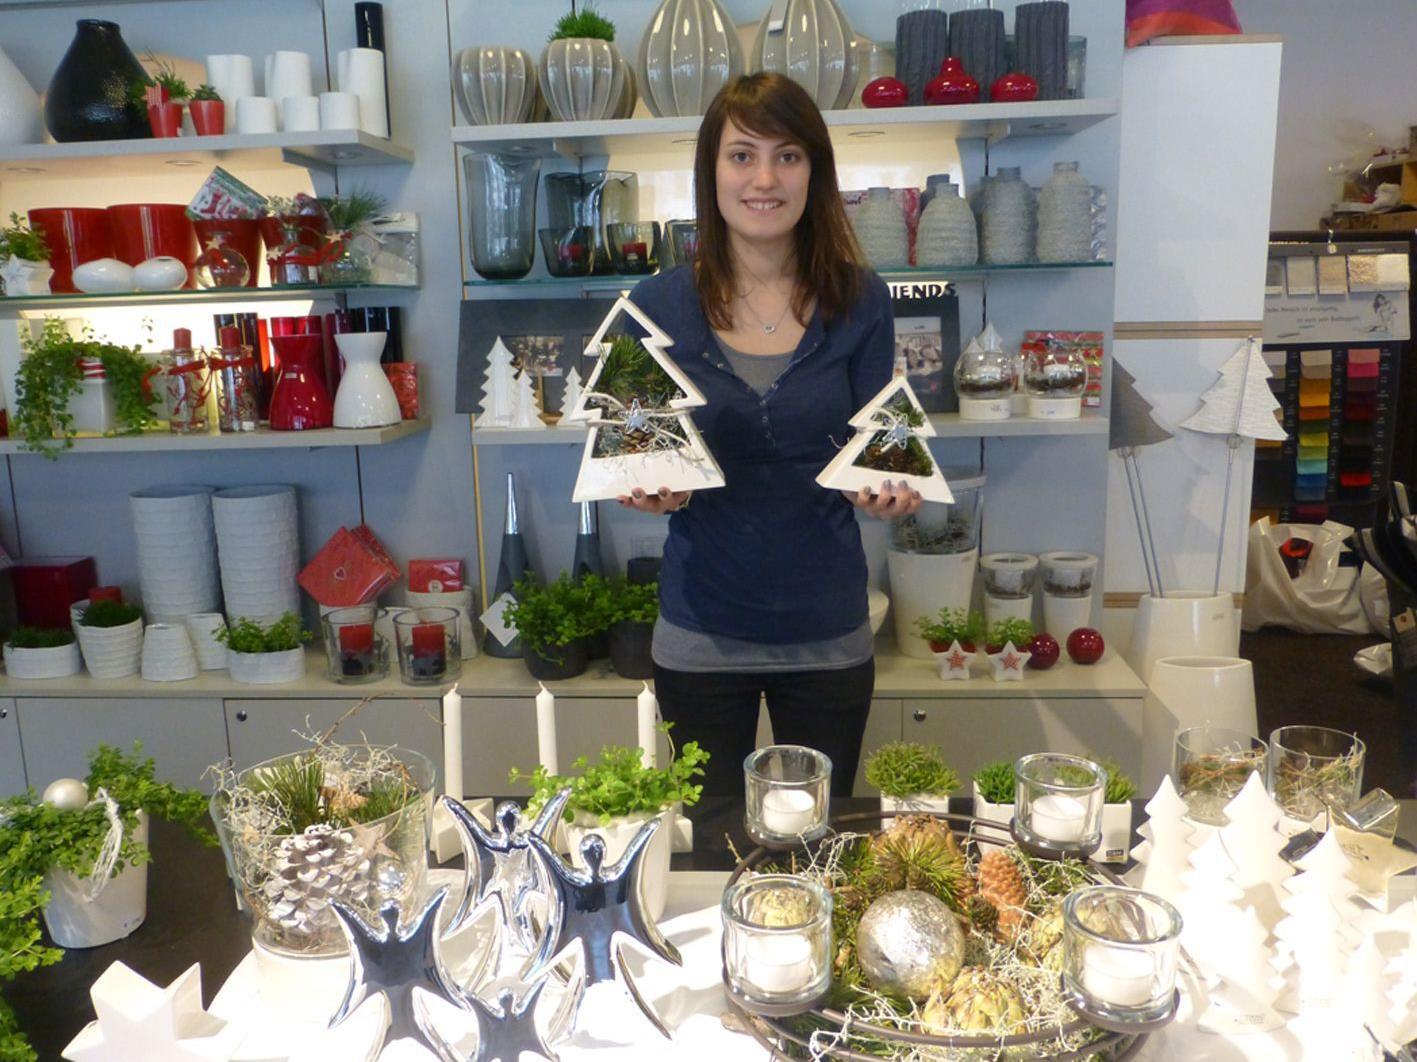 Martina Höfel zeigt edle Weihnachtsaccessoires bei mc2 wohnkultur am Schlossplatz.